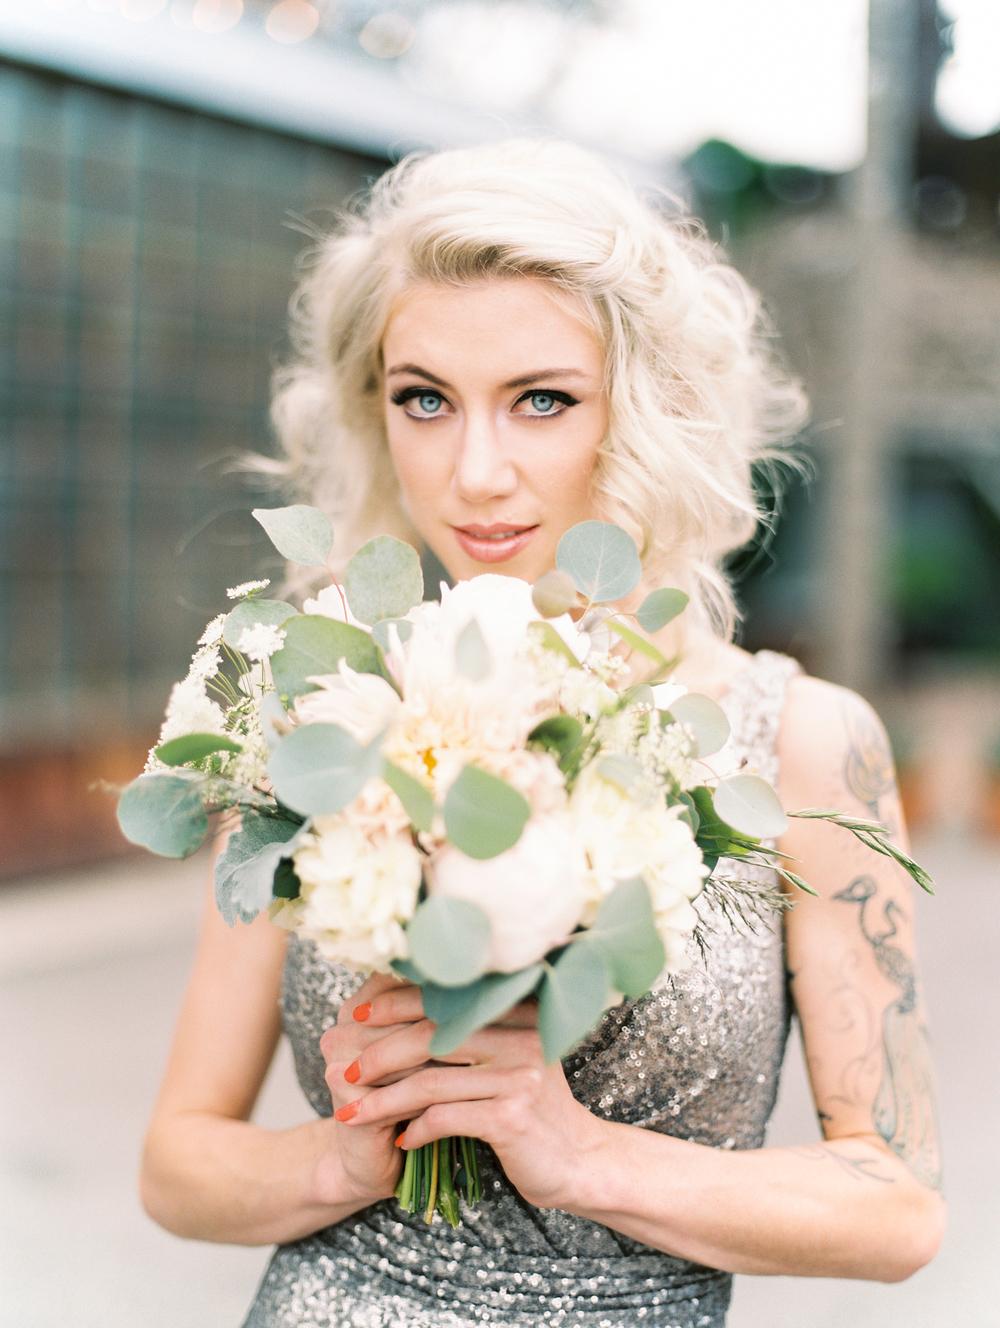 Blanc-Denver-wedding-inspiration-by-Lisa-O'Dwyer-Denver-fine-art-wedding-photographer-1.jpg